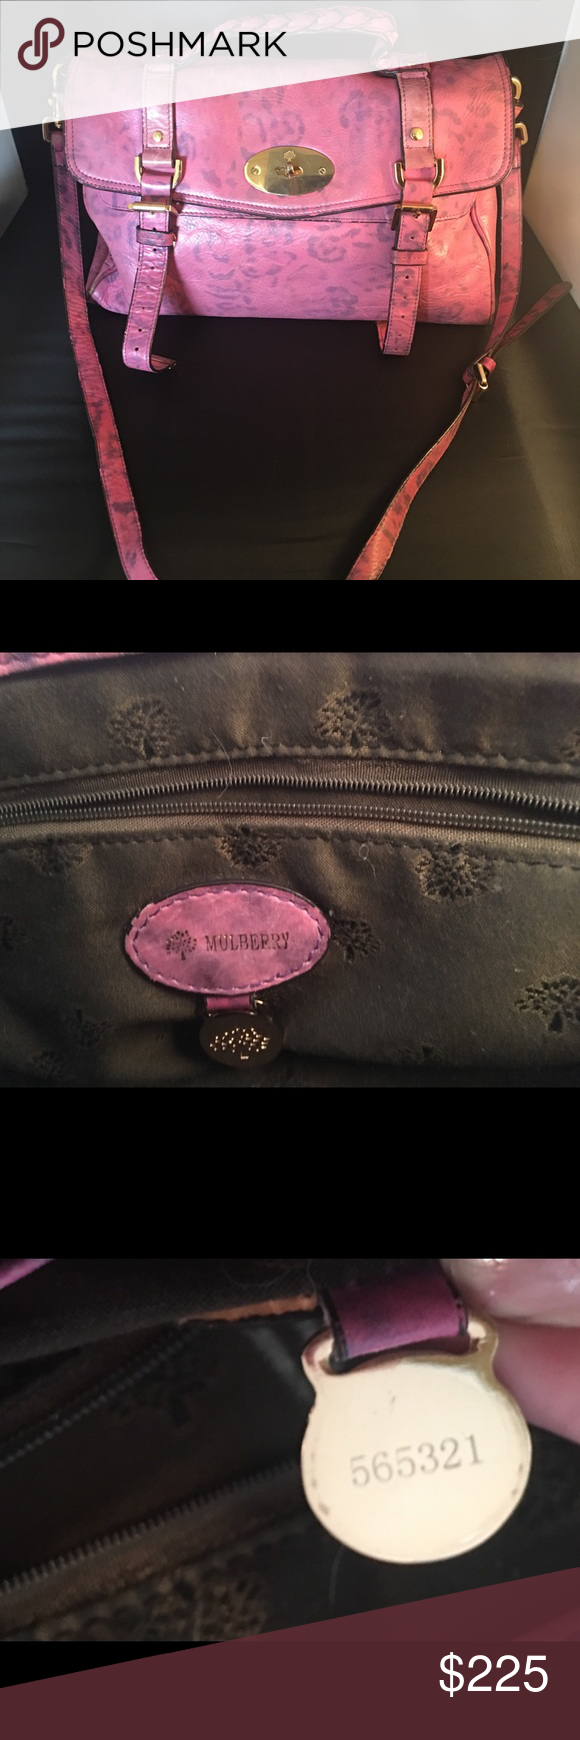 2068fd2d32 Mulberry Alexa pink leopard handbag crossbody Mulberry handbag